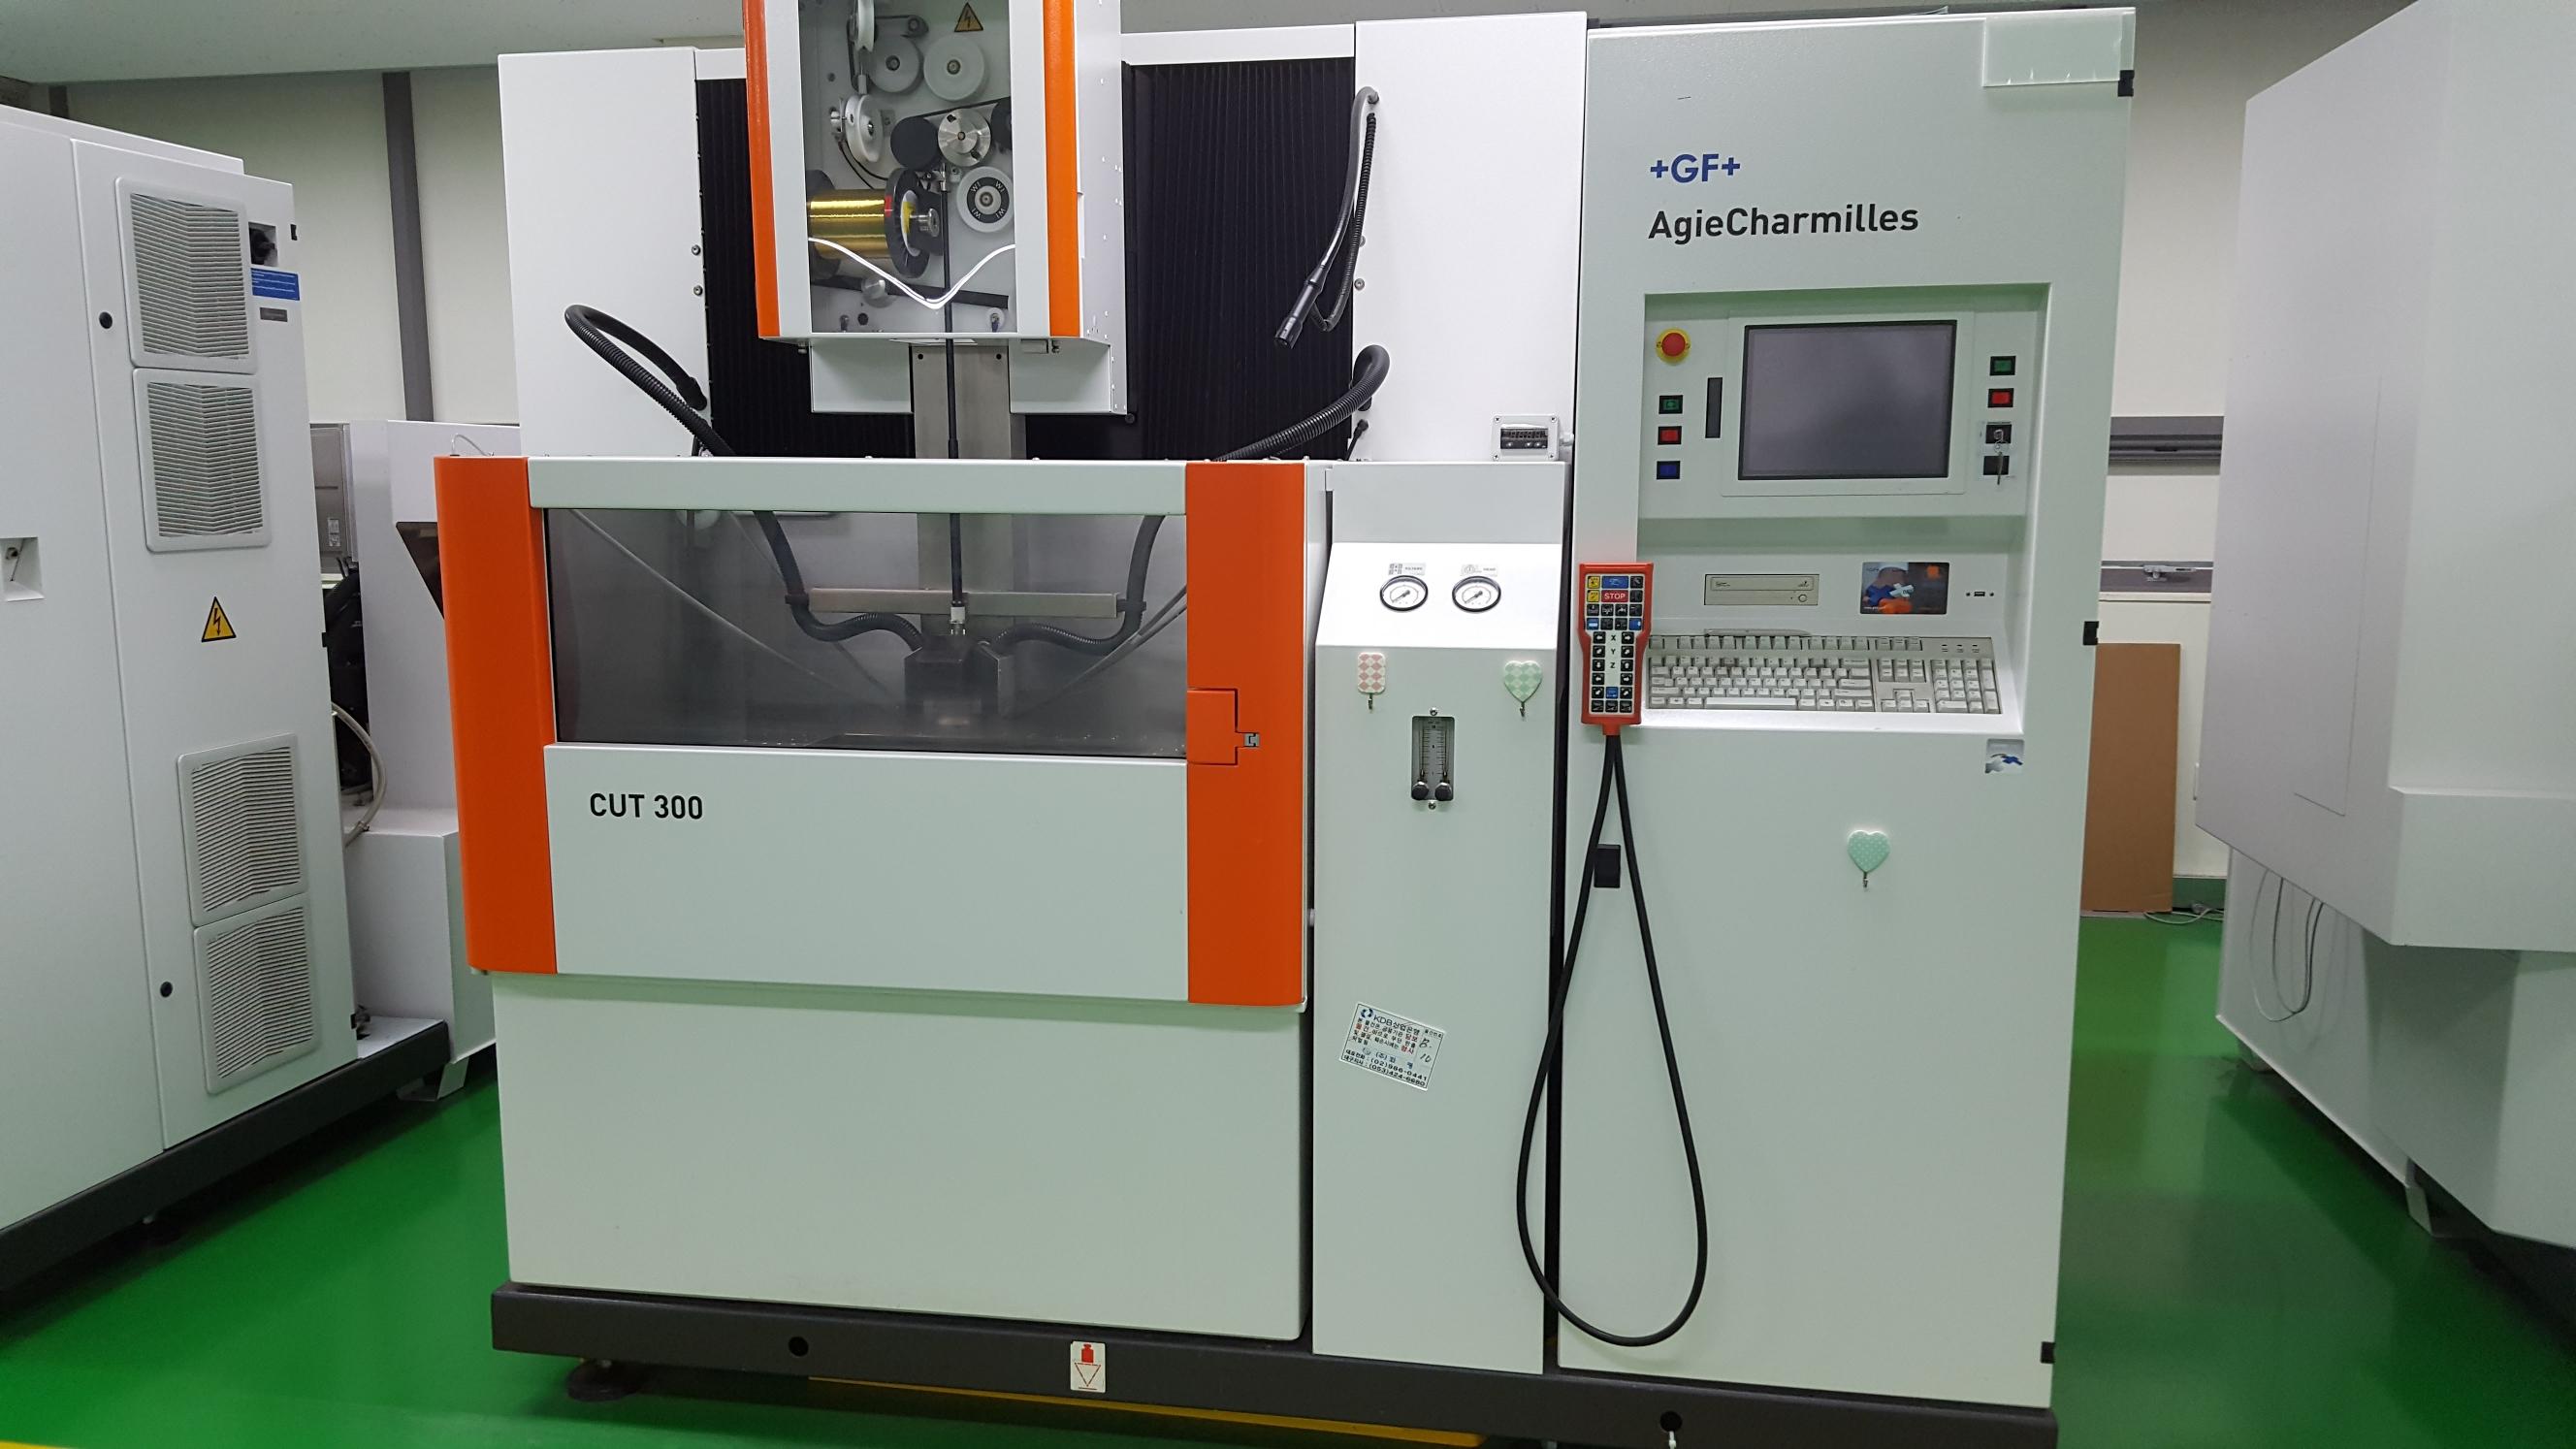 Agie Charmilles CUT 300 Wire cutting edm machine - Exapro